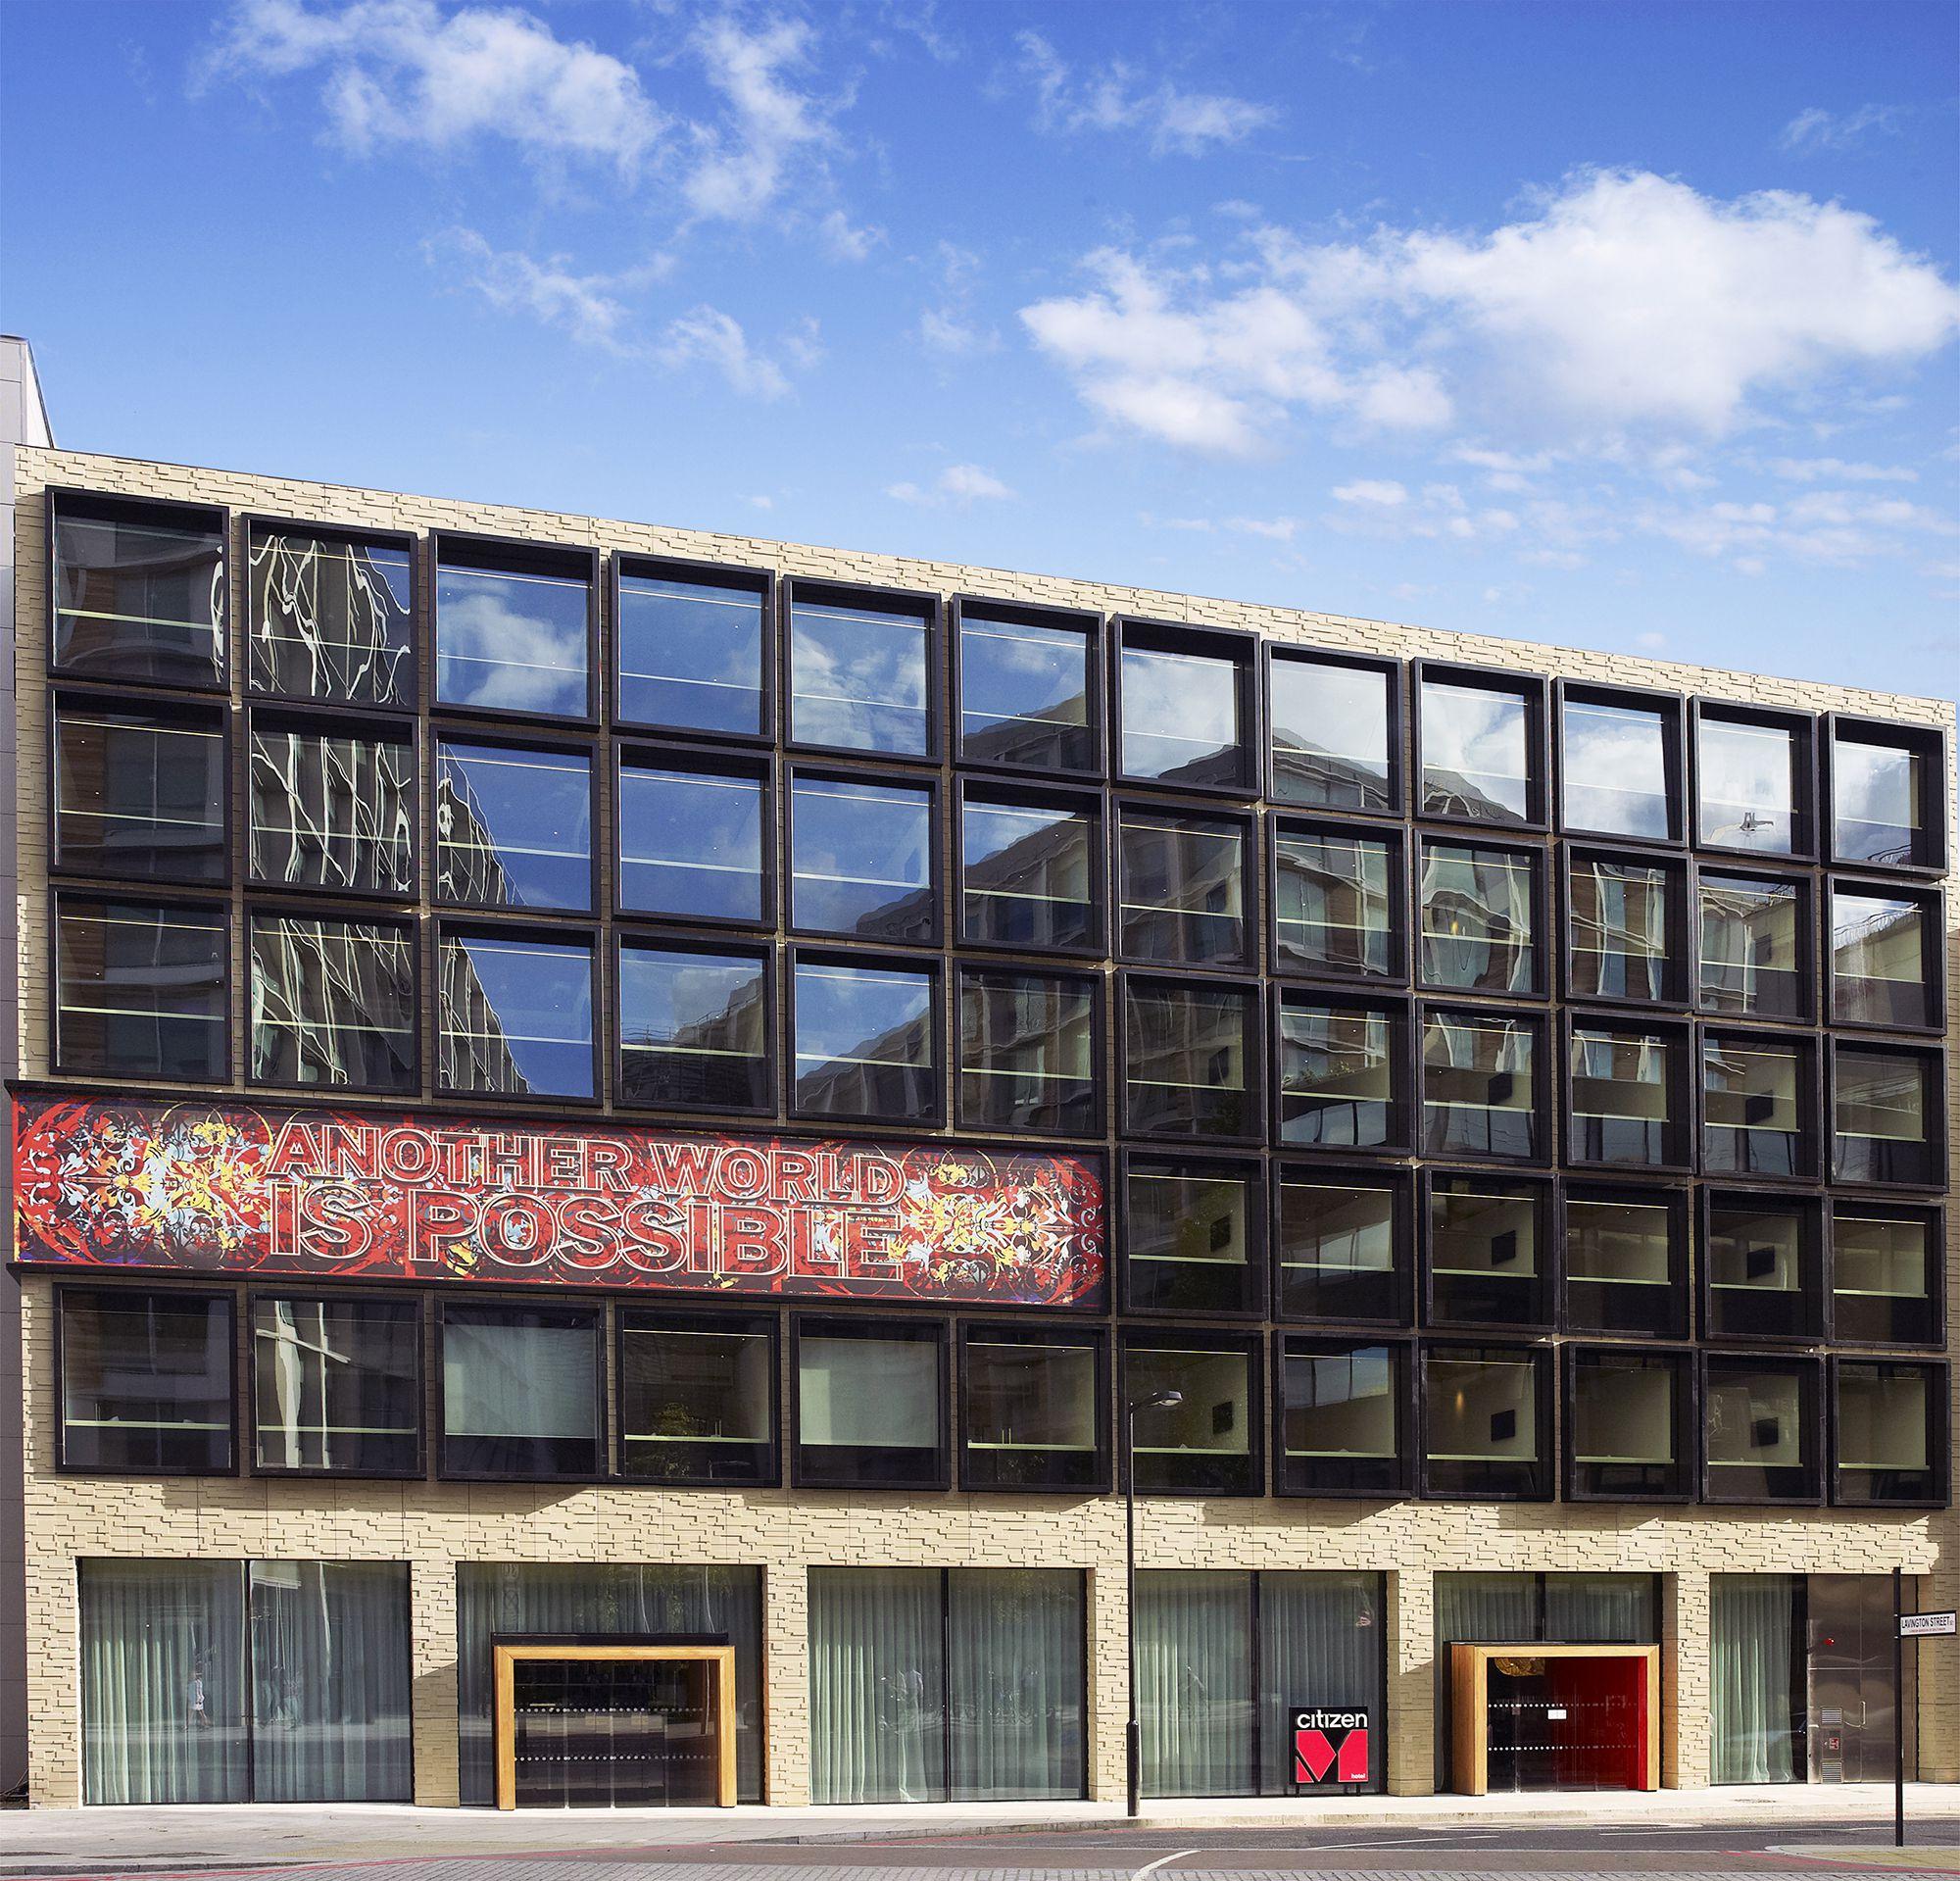 Citizenm Hotel Bankside London By Concrete Caandesign